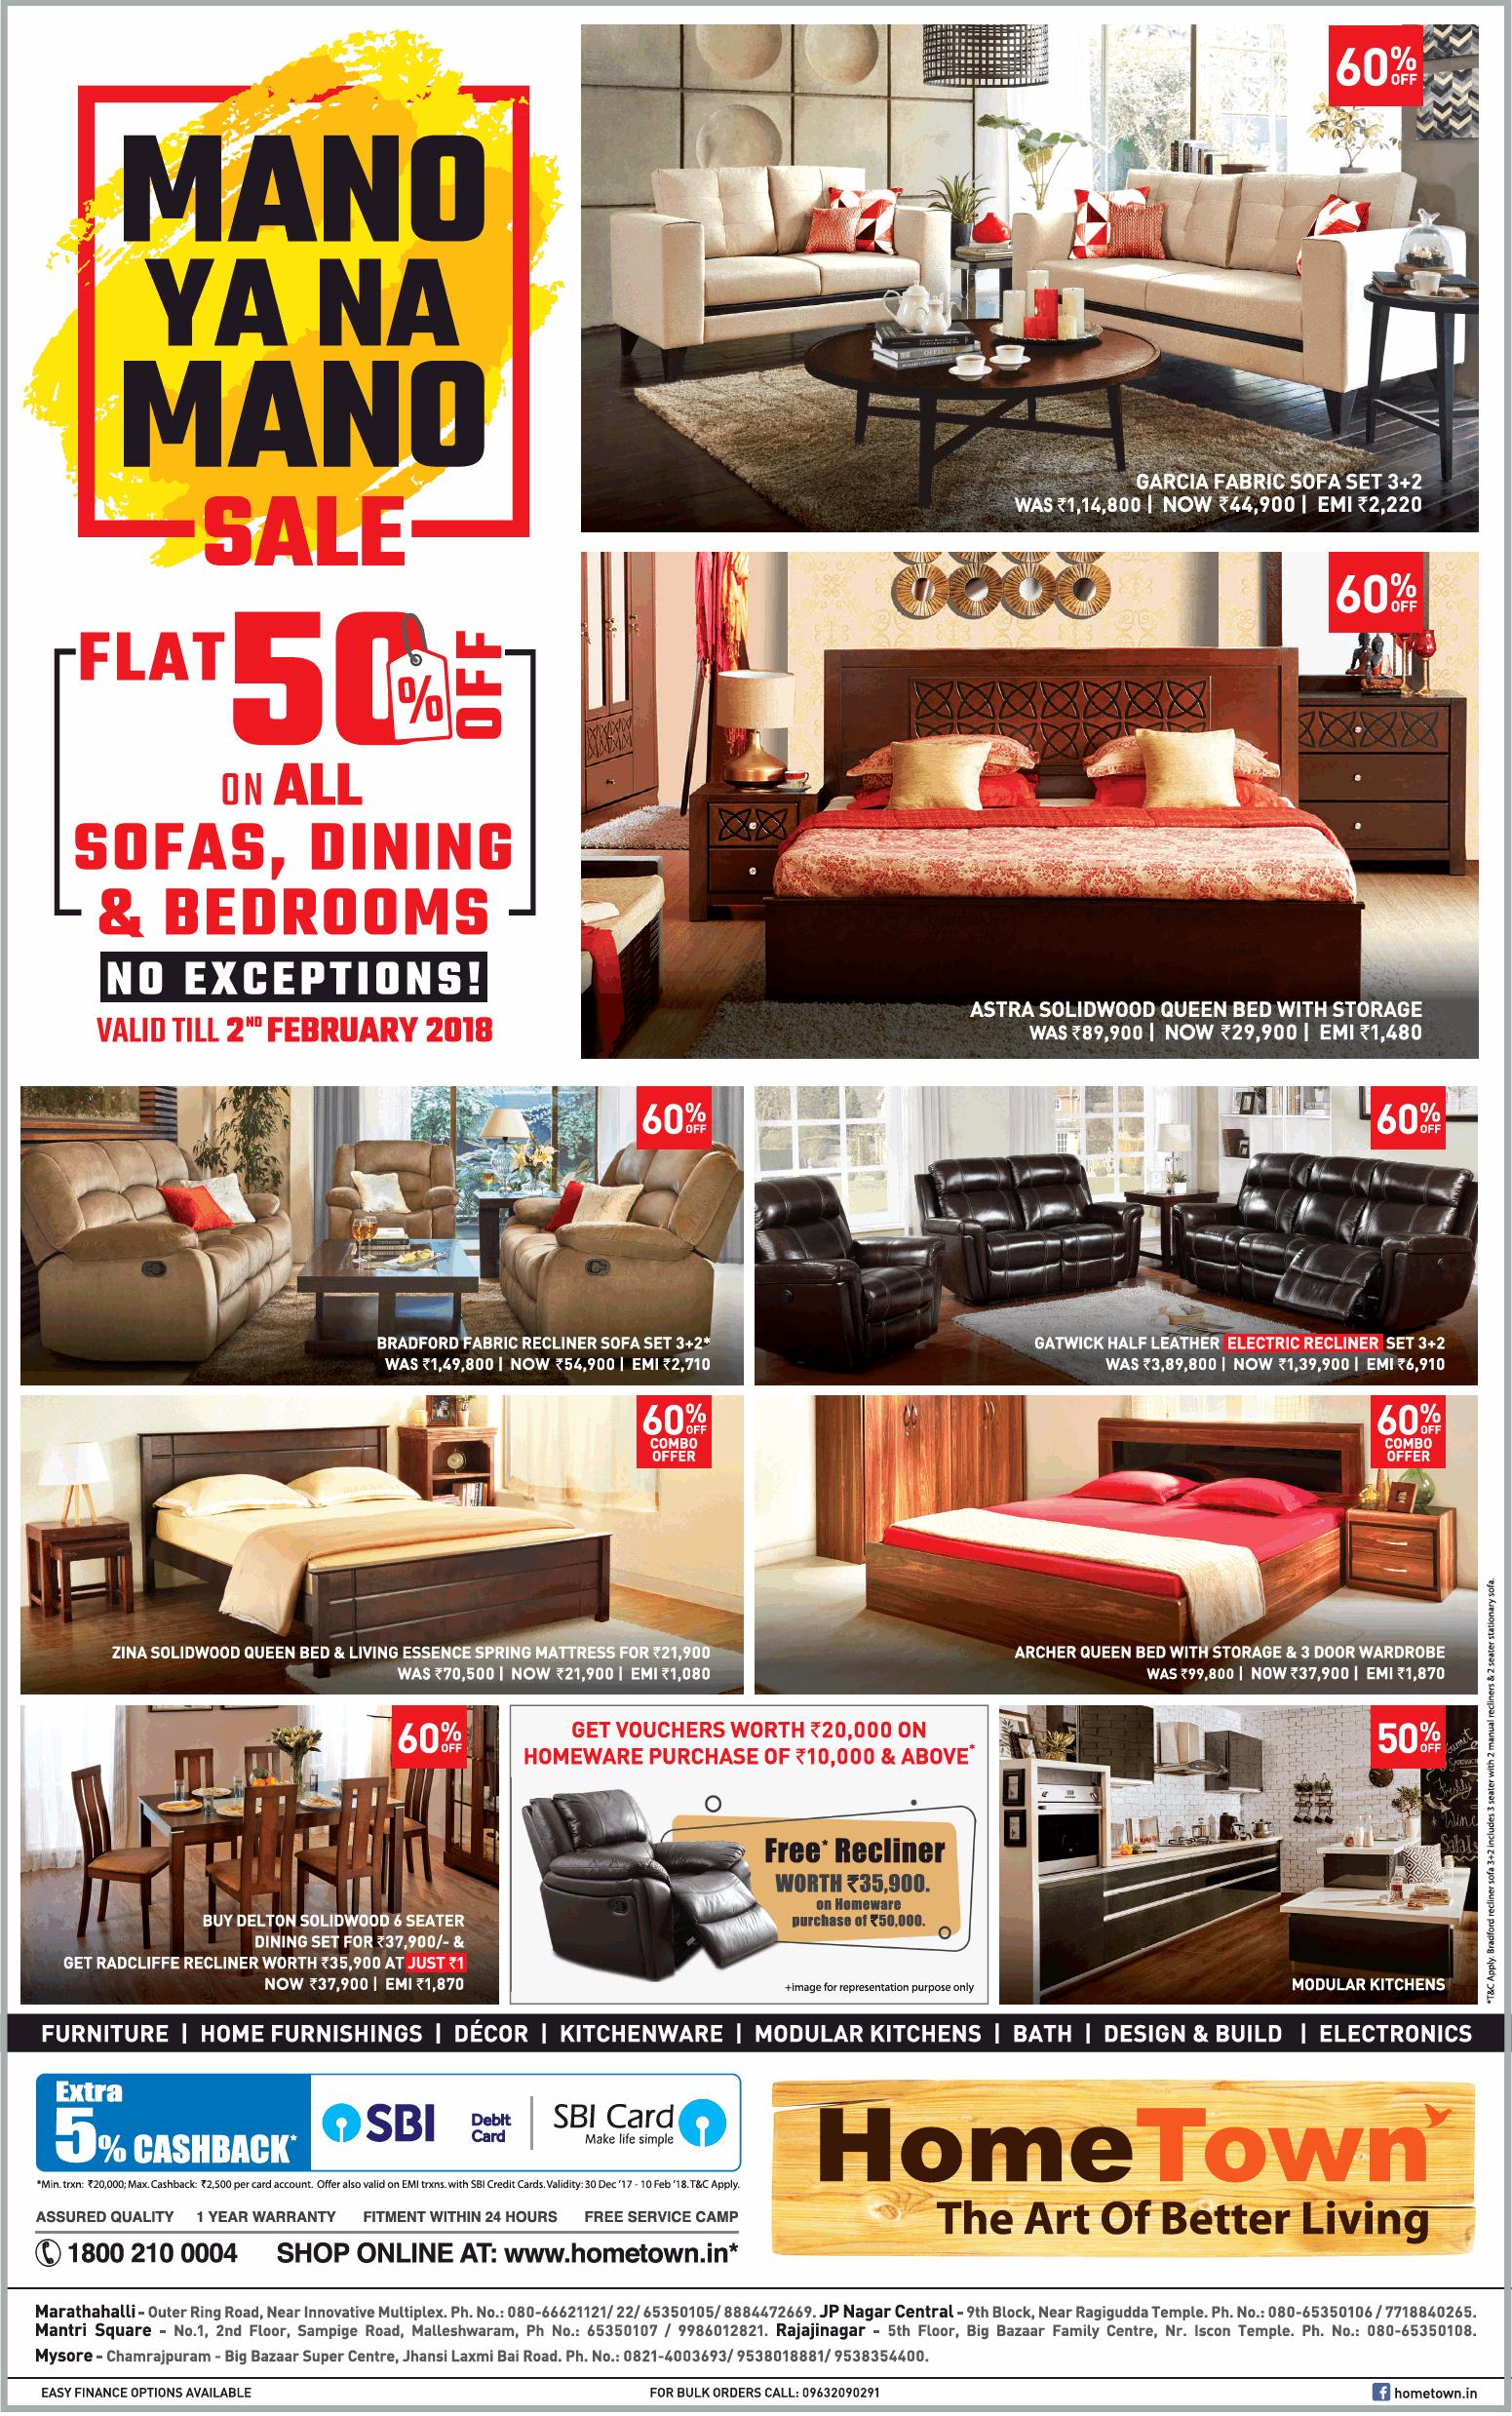 Hometown Furniture Mano Ya Na Mano Sale Flat 50 Off On All Sofas Ad